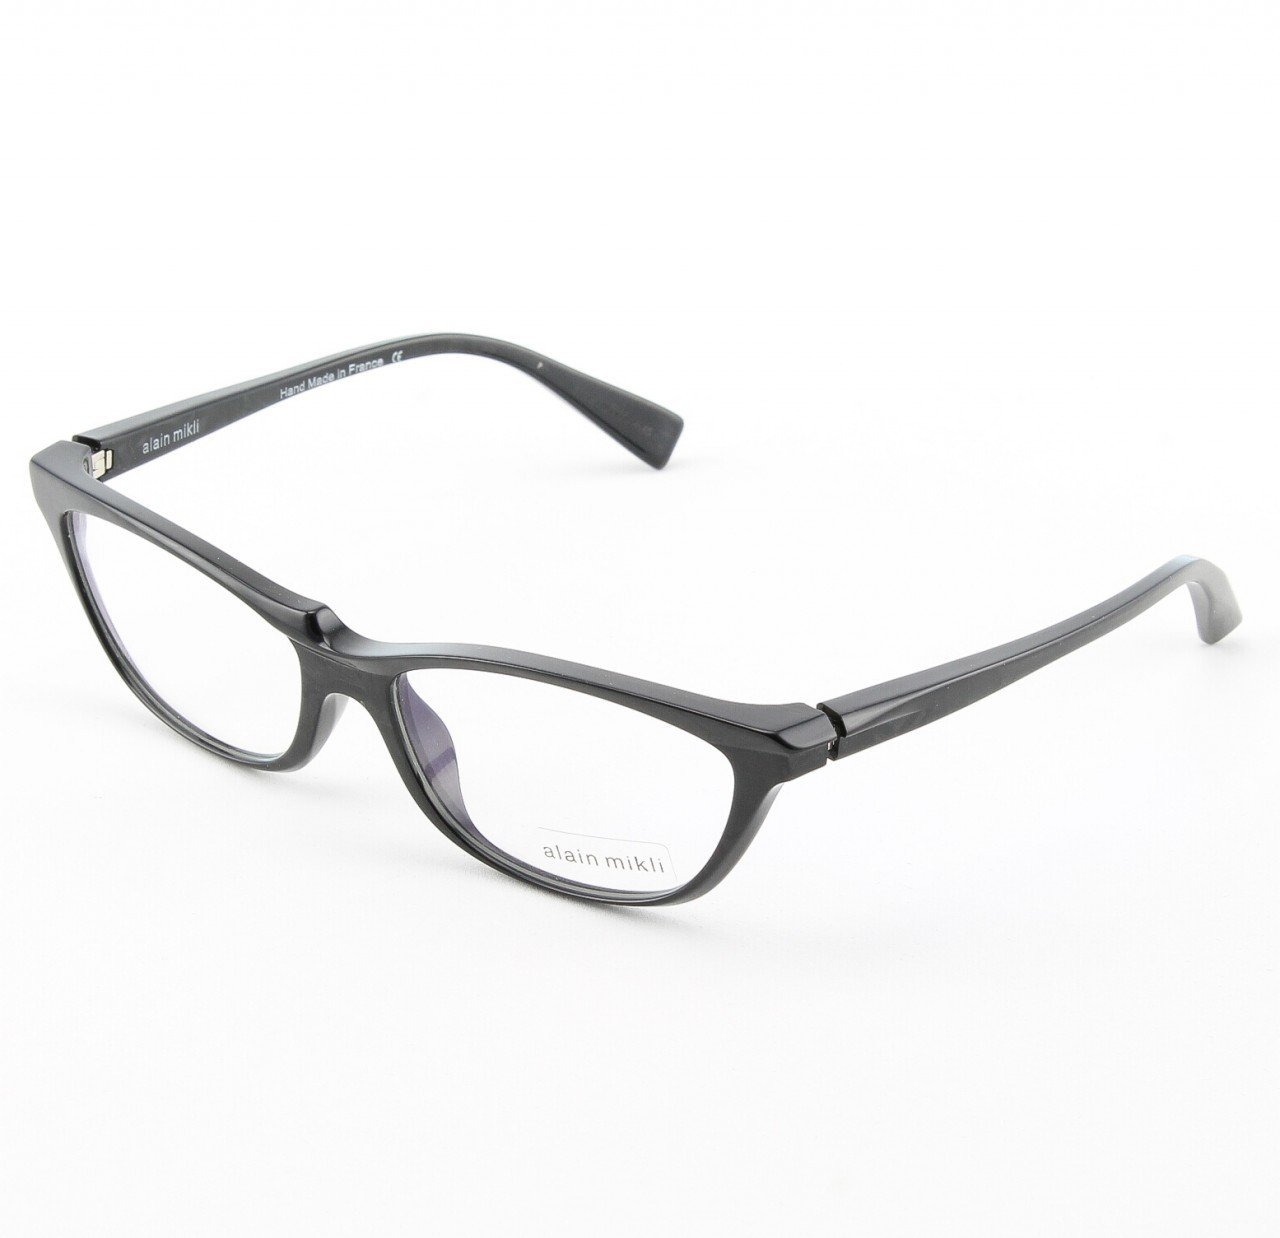 Alain Mikli Eyeglasses AL0882 Col. 3 Mottled Black